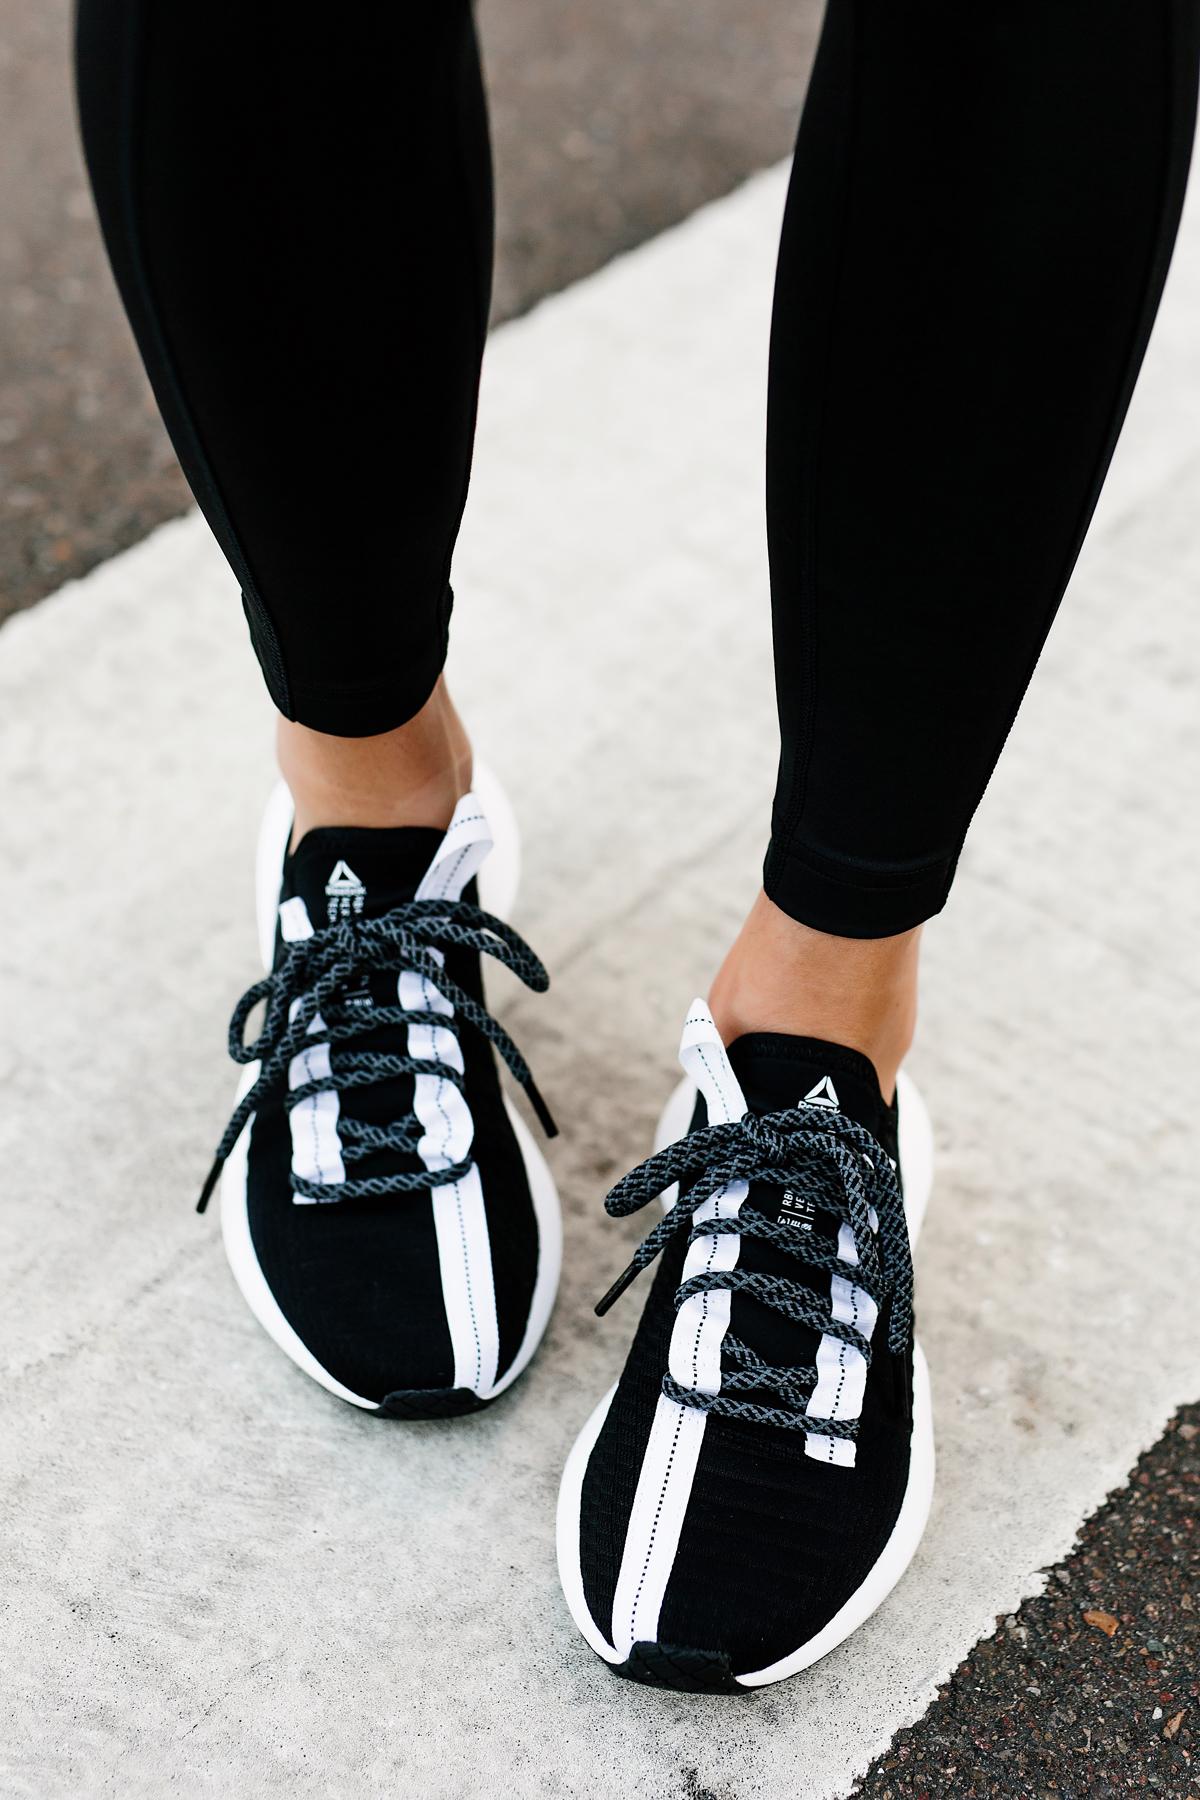 Woman Wearing Black Leggings Reebok Sole Fury Black Sneakers Fashion Jackson San Diego Fashion Blogger